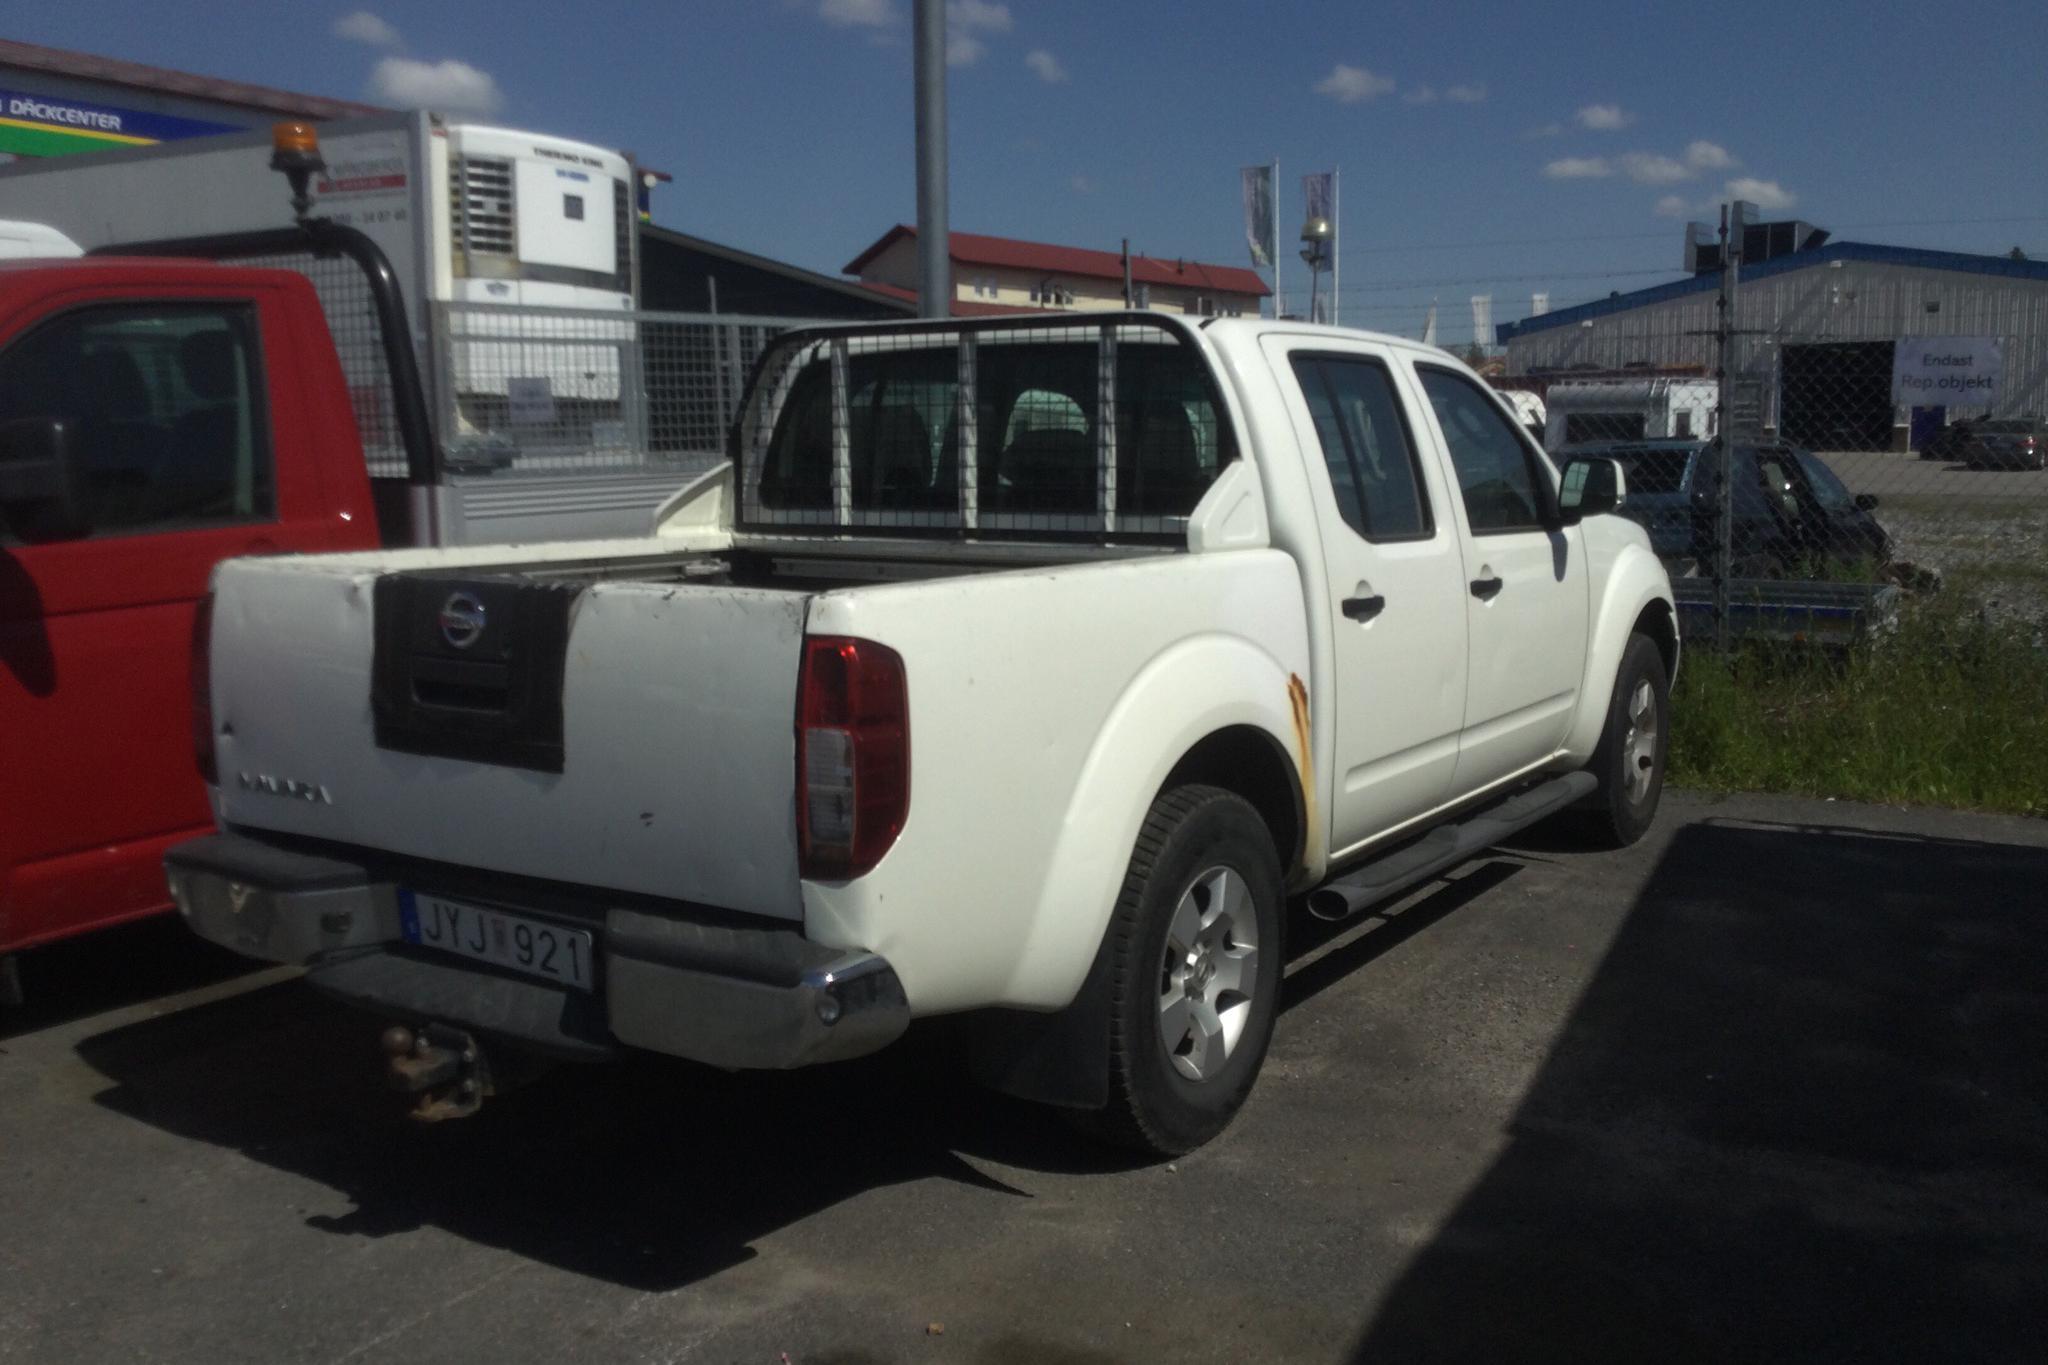 Nissan Navara 2.5 dCi 4WD (171hk) - 12 473 mil - Manuell - vit - 2009